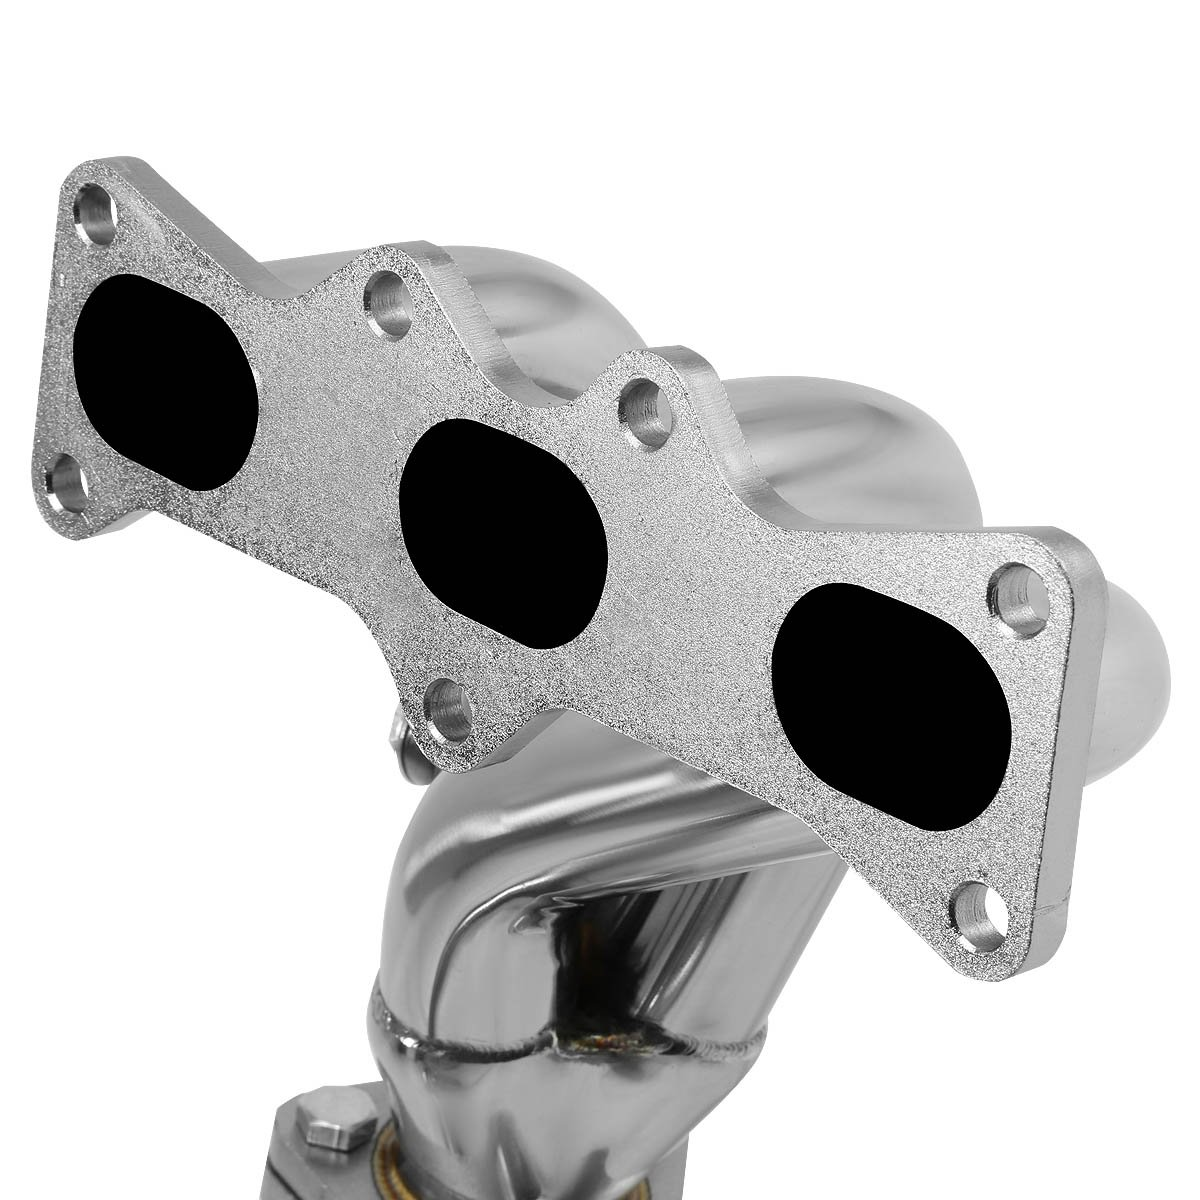 DNA Motoring HDS-FP93V6 Stainless Steel Exhaust Header Manifold